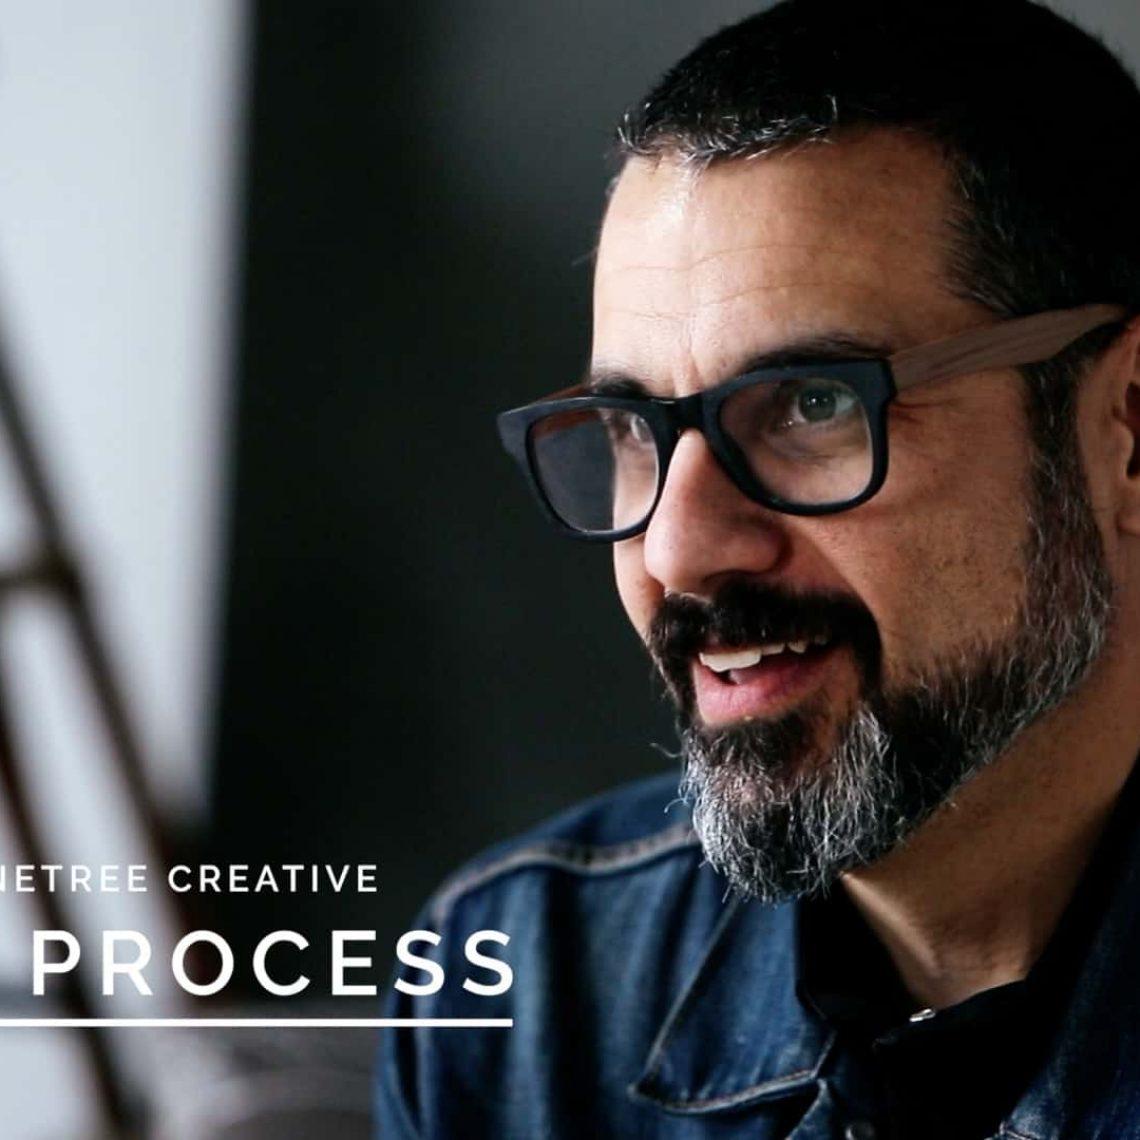 Stonetree Creative portrait process video